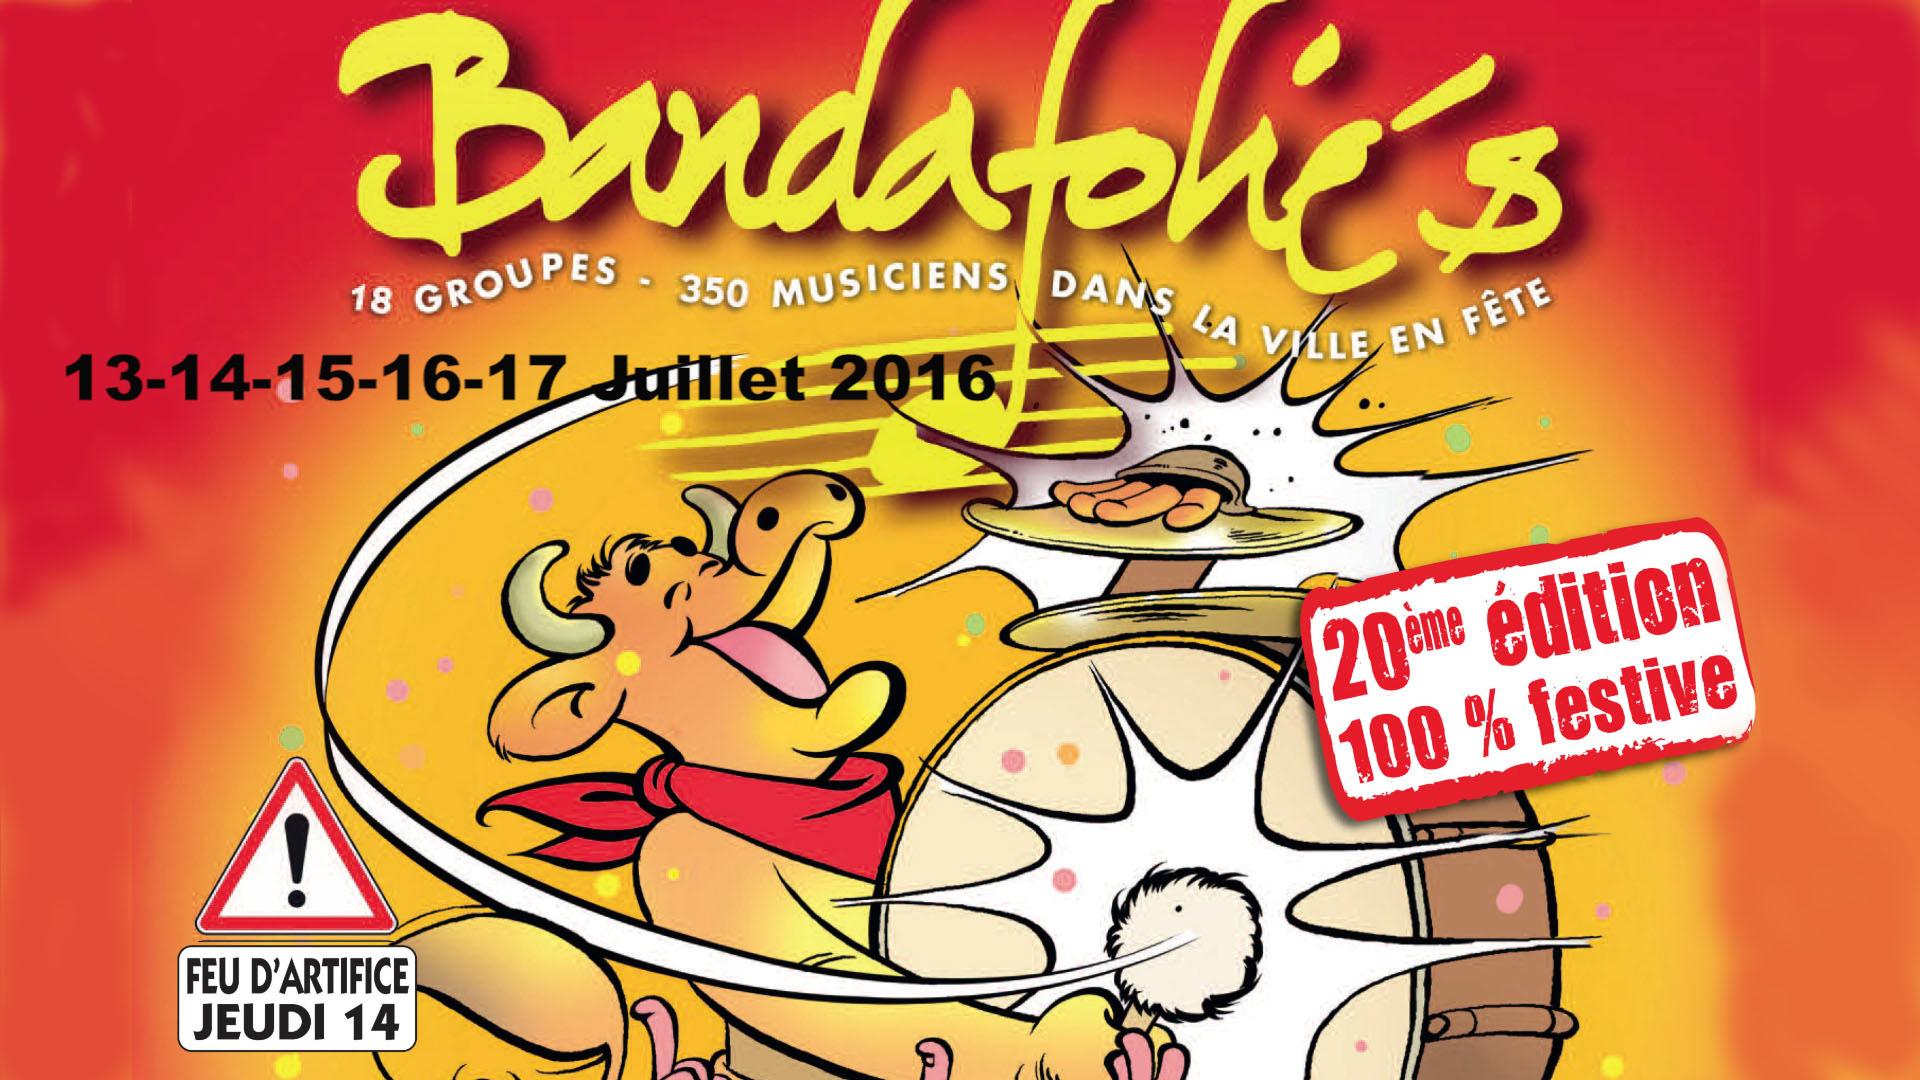 Présentation Bandafolies 2016